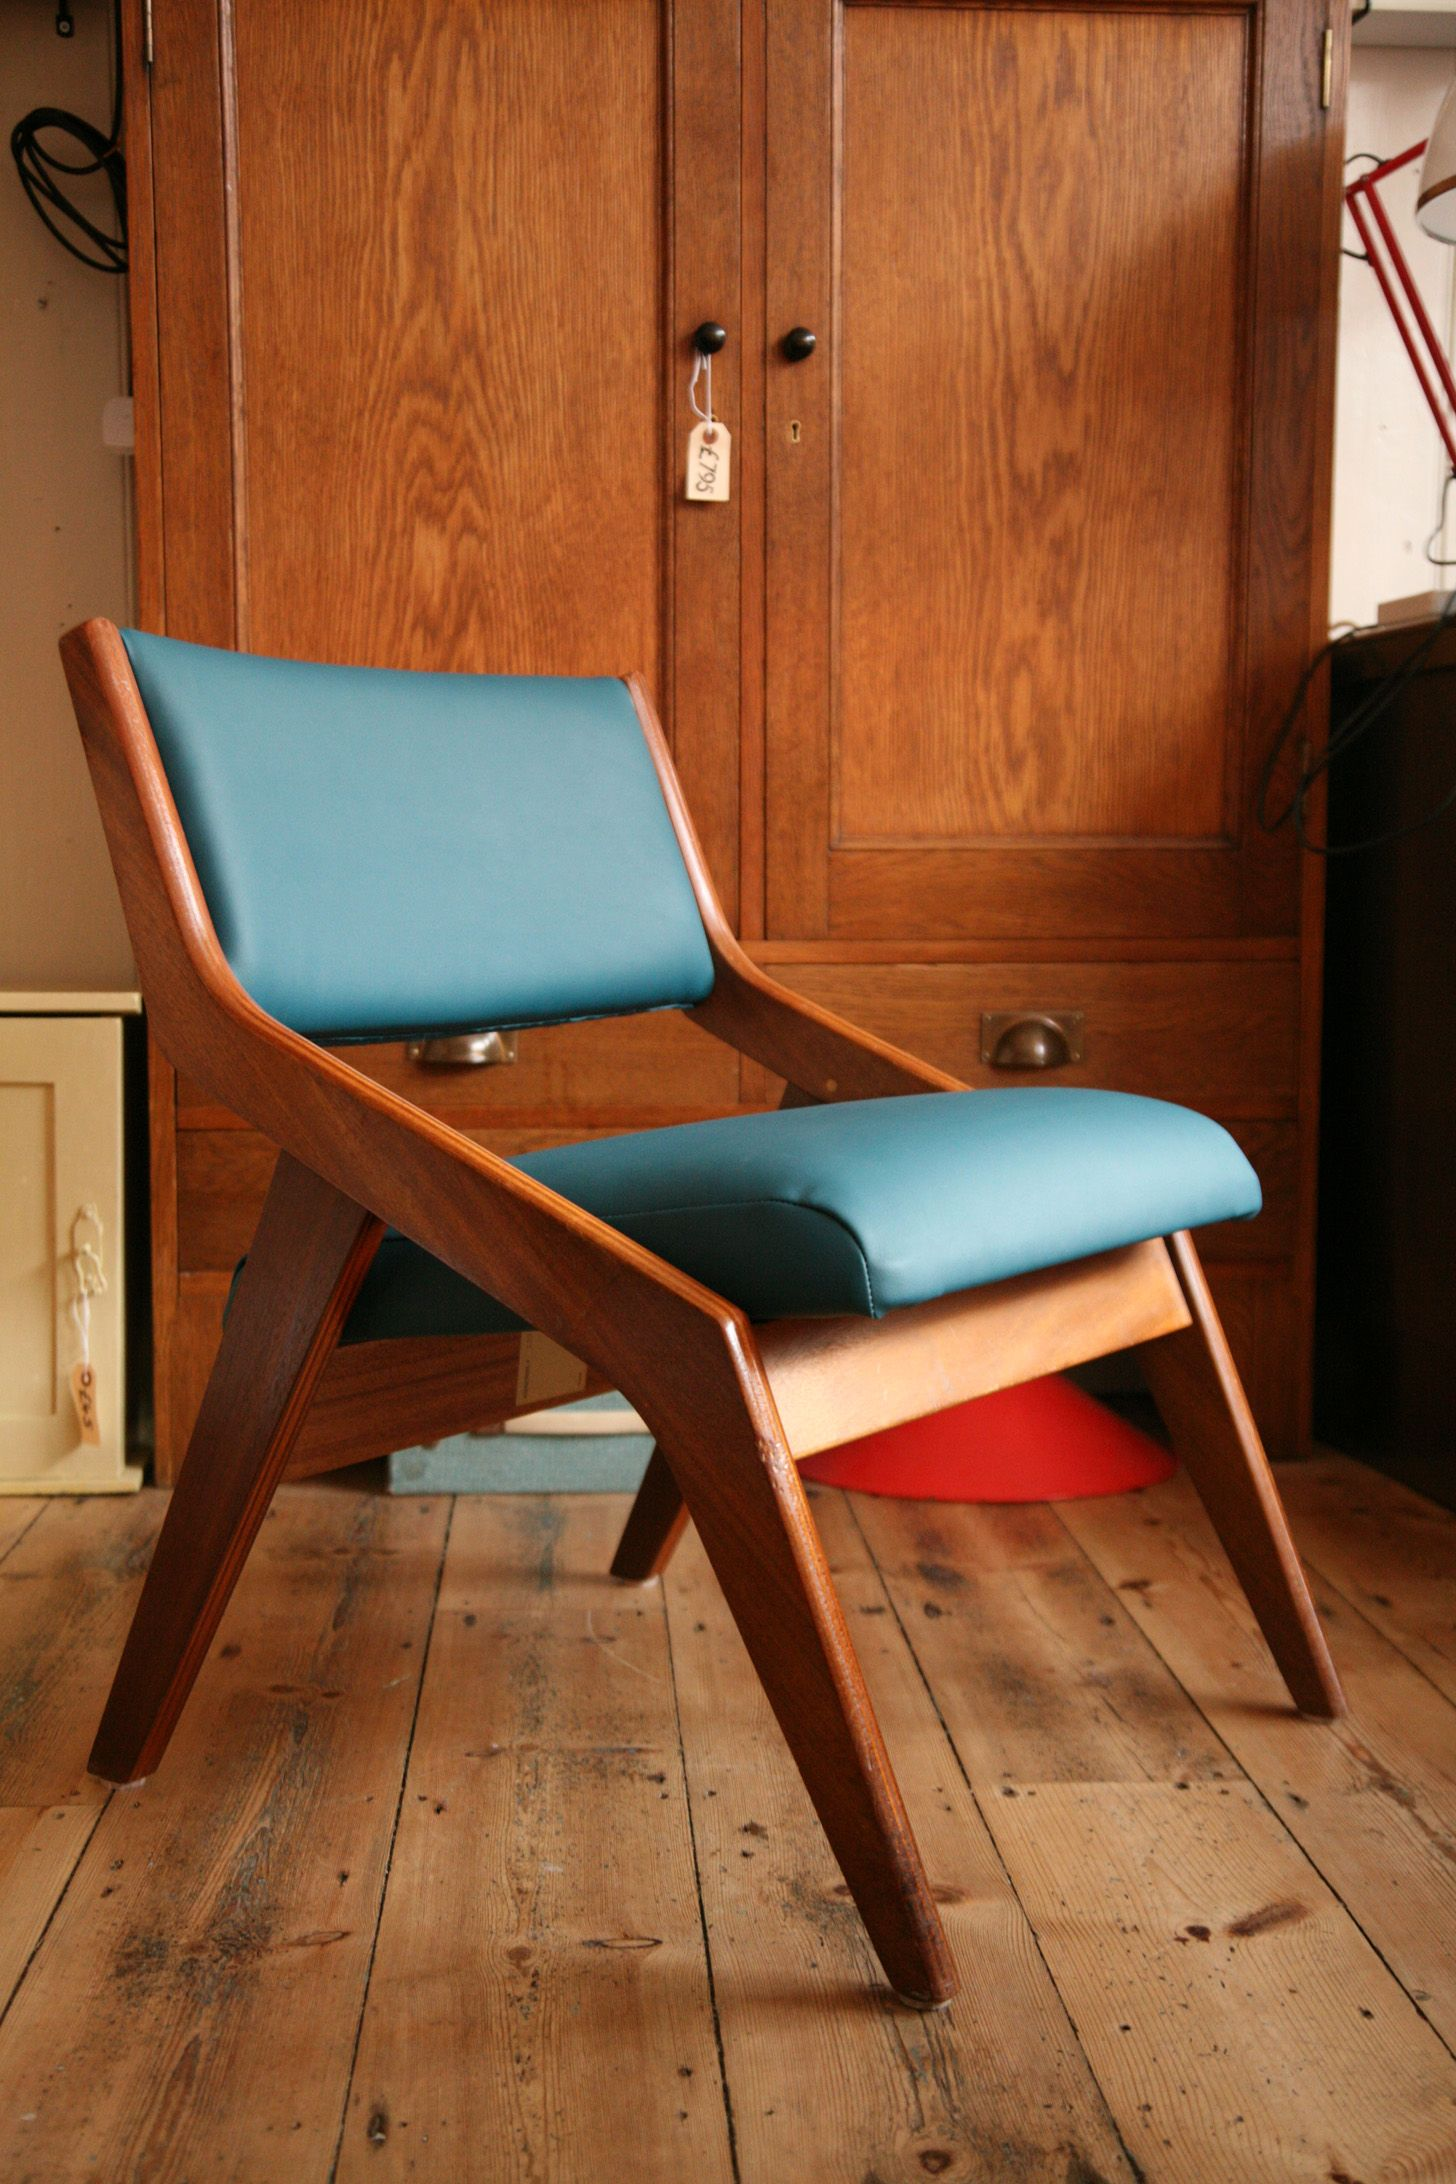 1950s Chair By Neil Morris Furniture Design Modern Mid Century